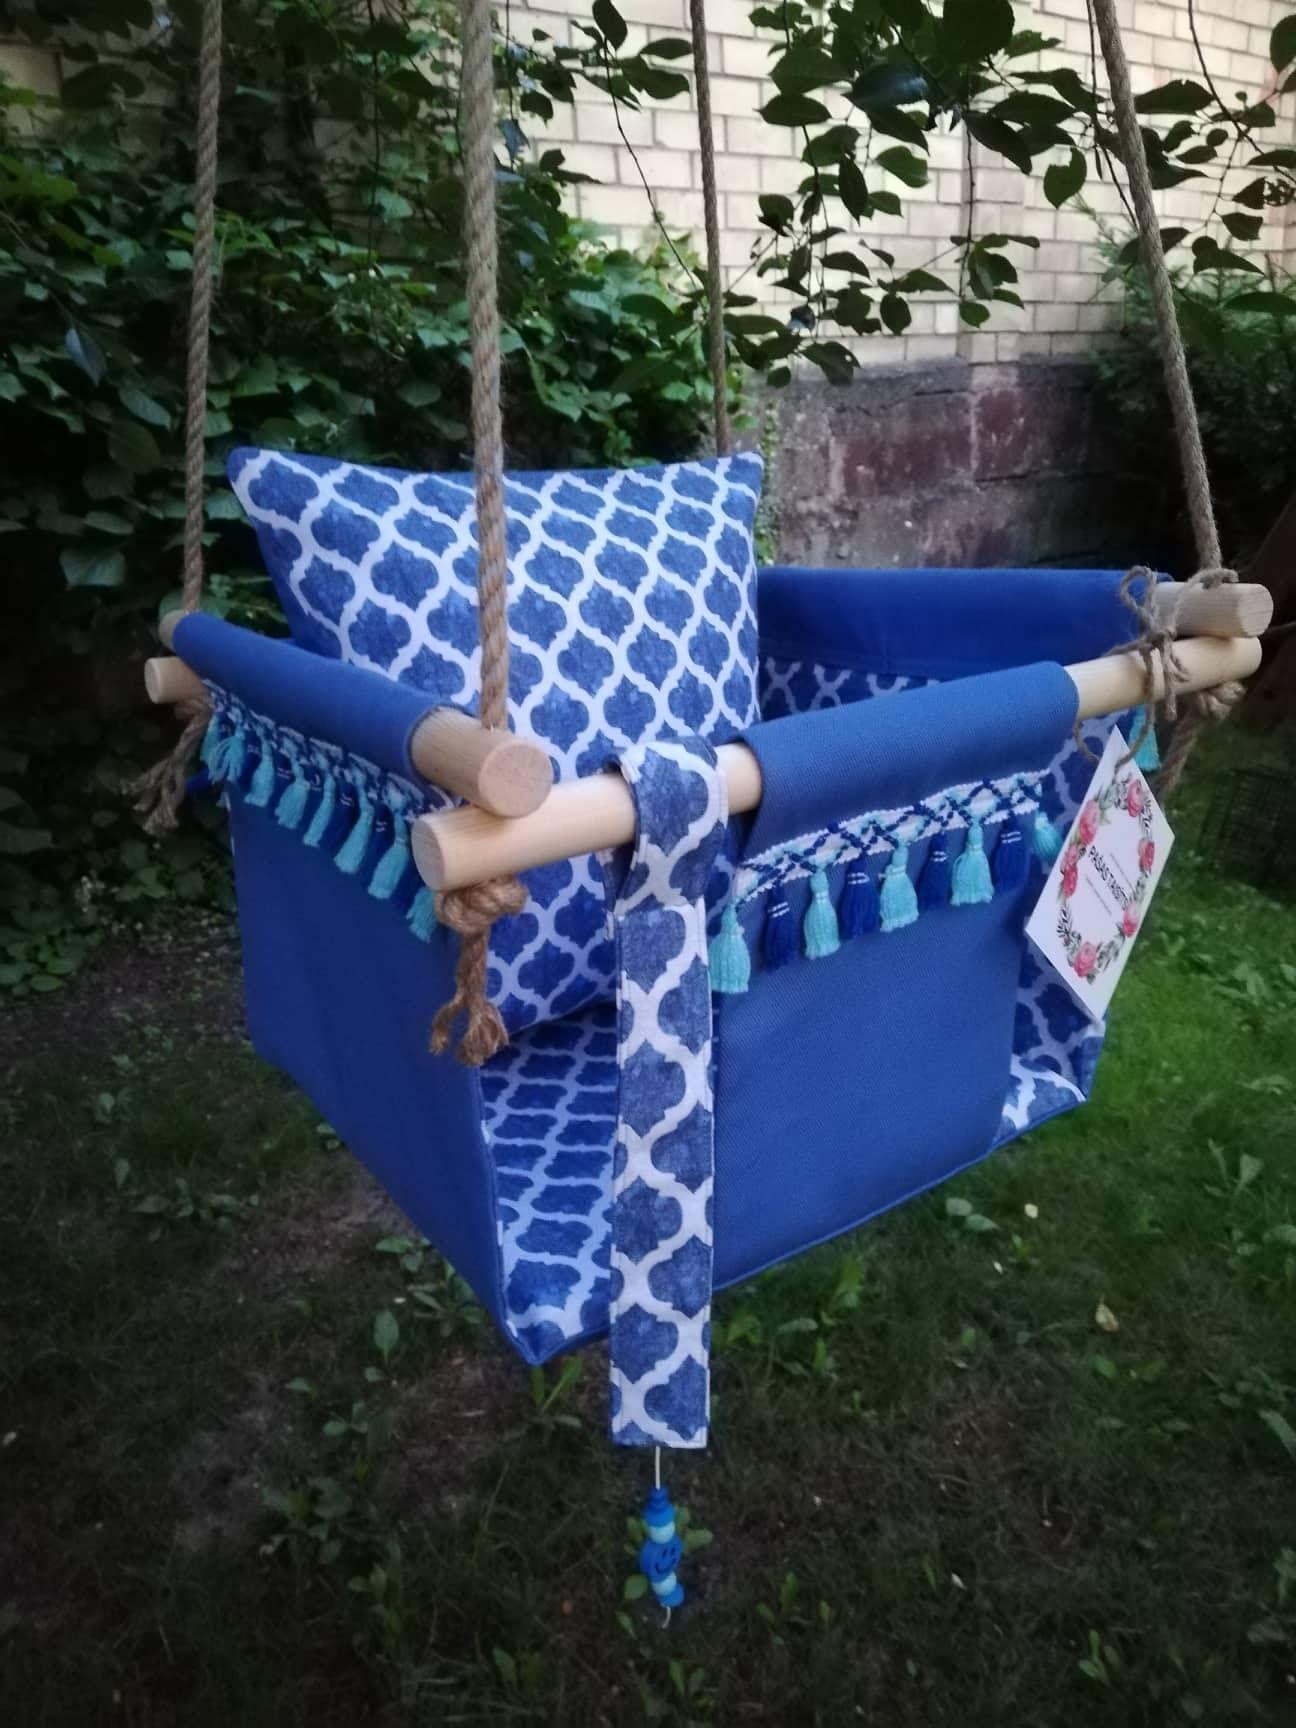 Baby swing toddler swing indoor swing nursery decor baby hammock